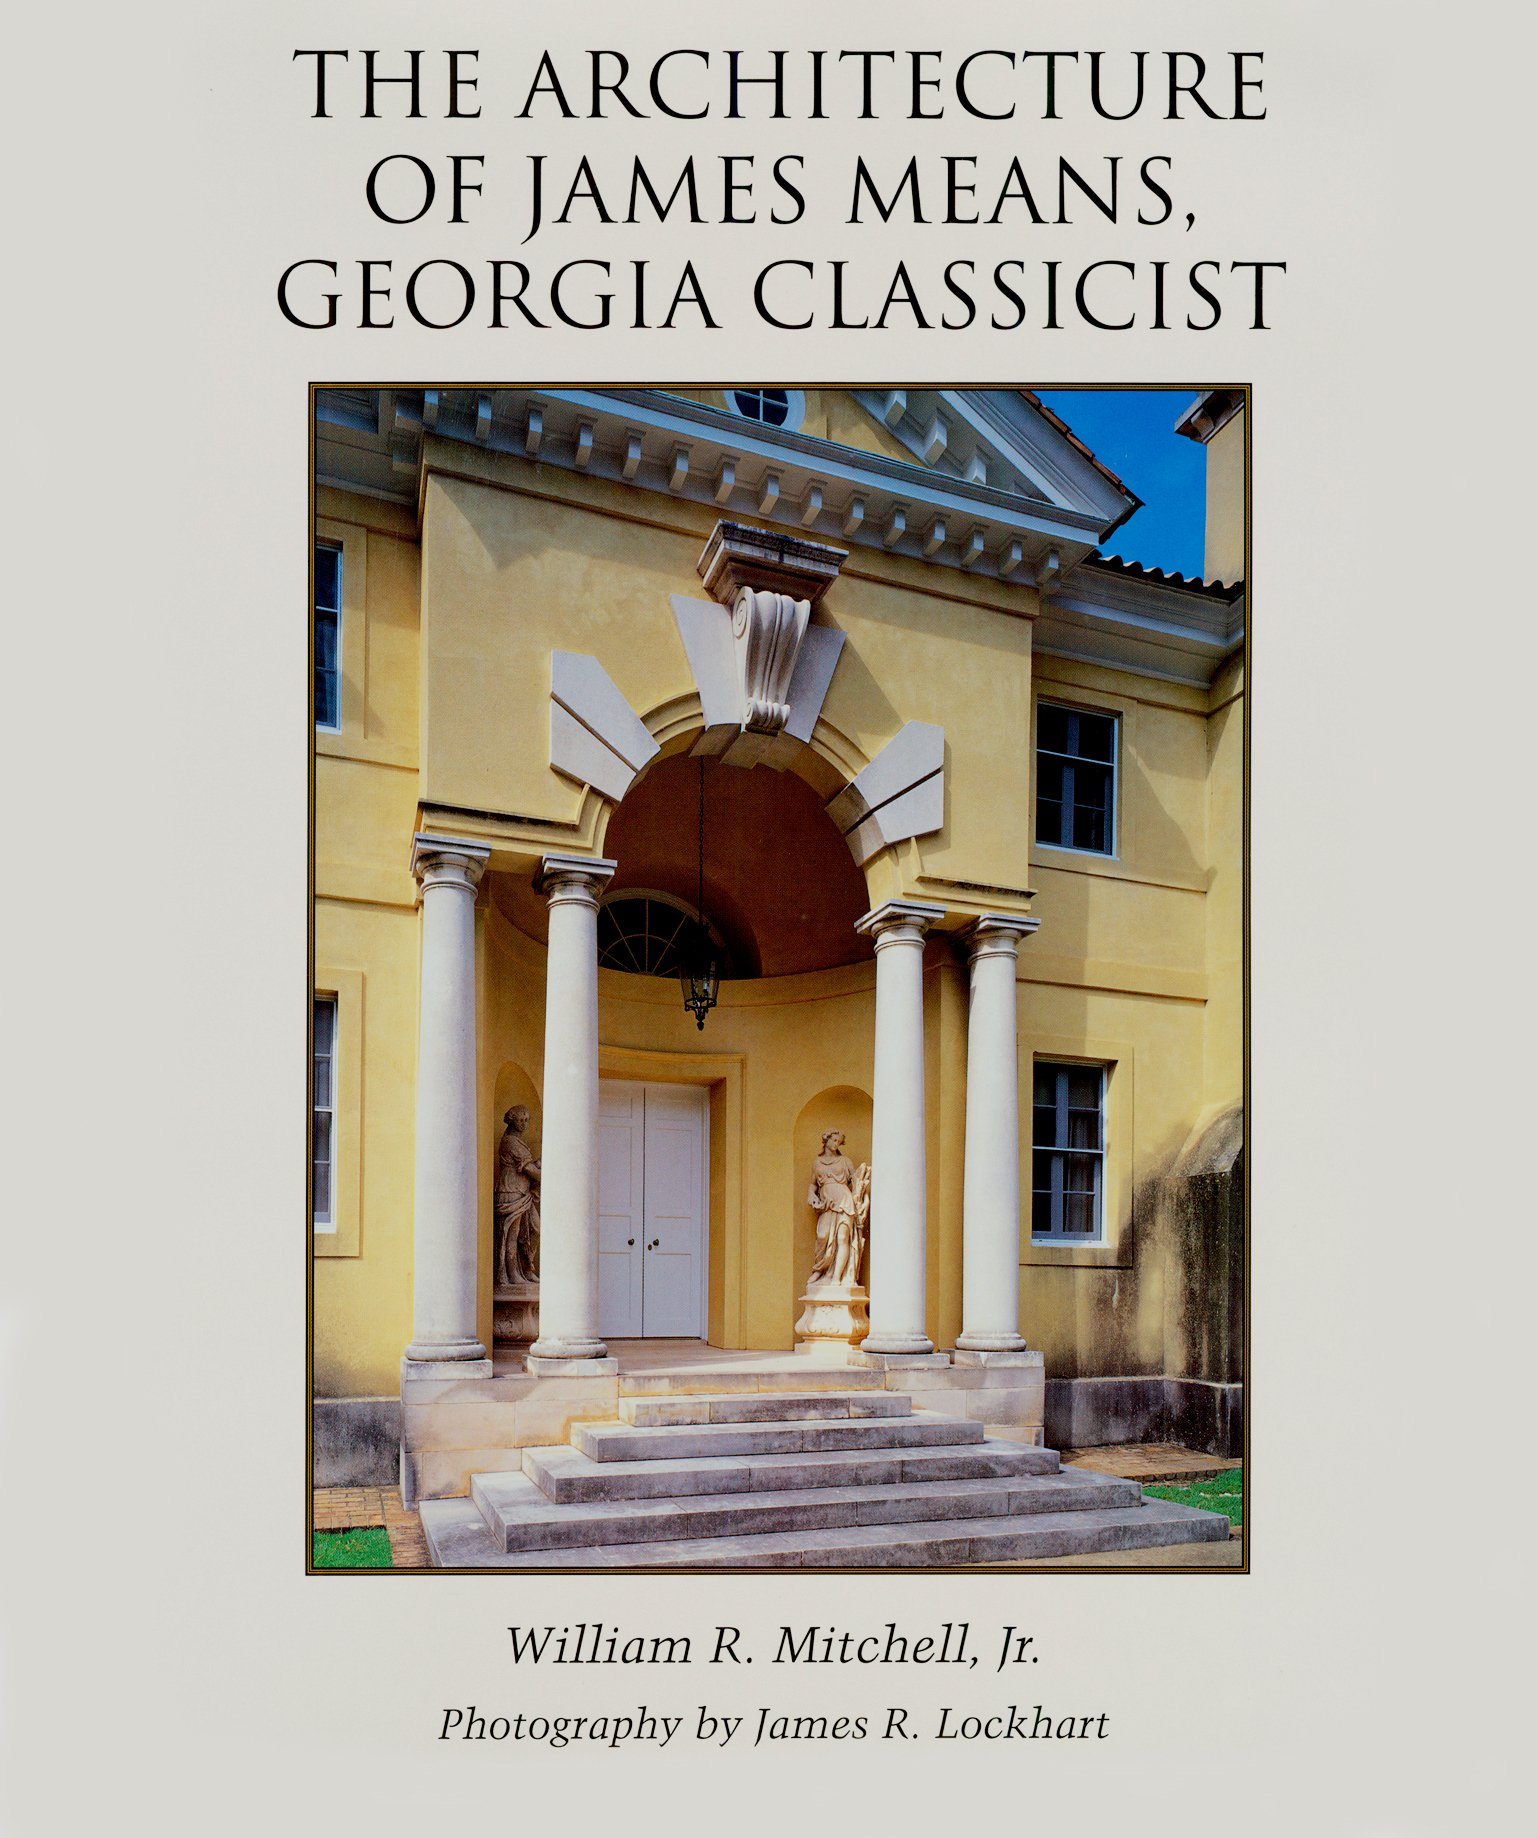 the architecture of james means georgia classicist william r